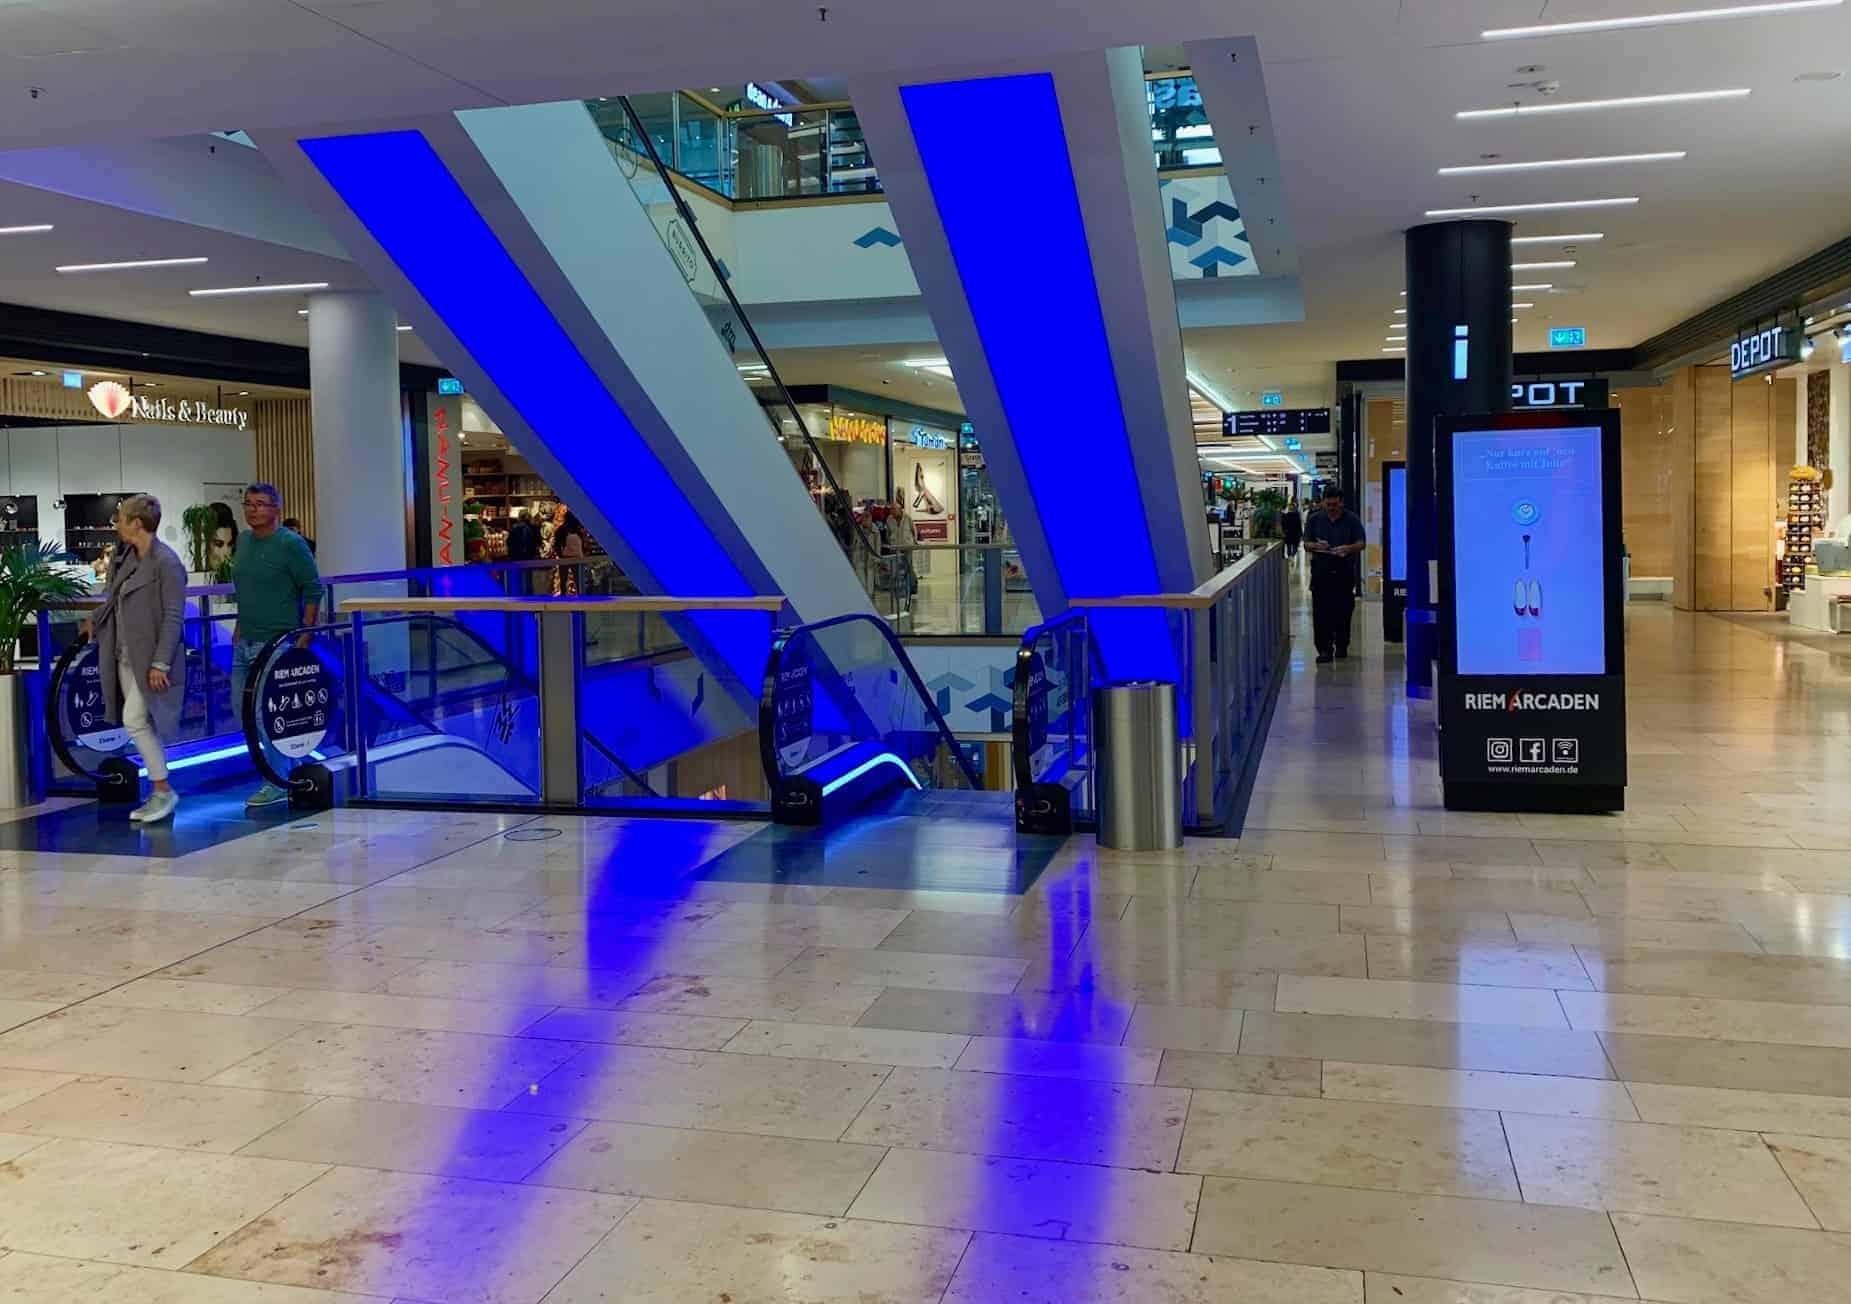 München_Shopping_Riem_Arcaden_Erster_Stock